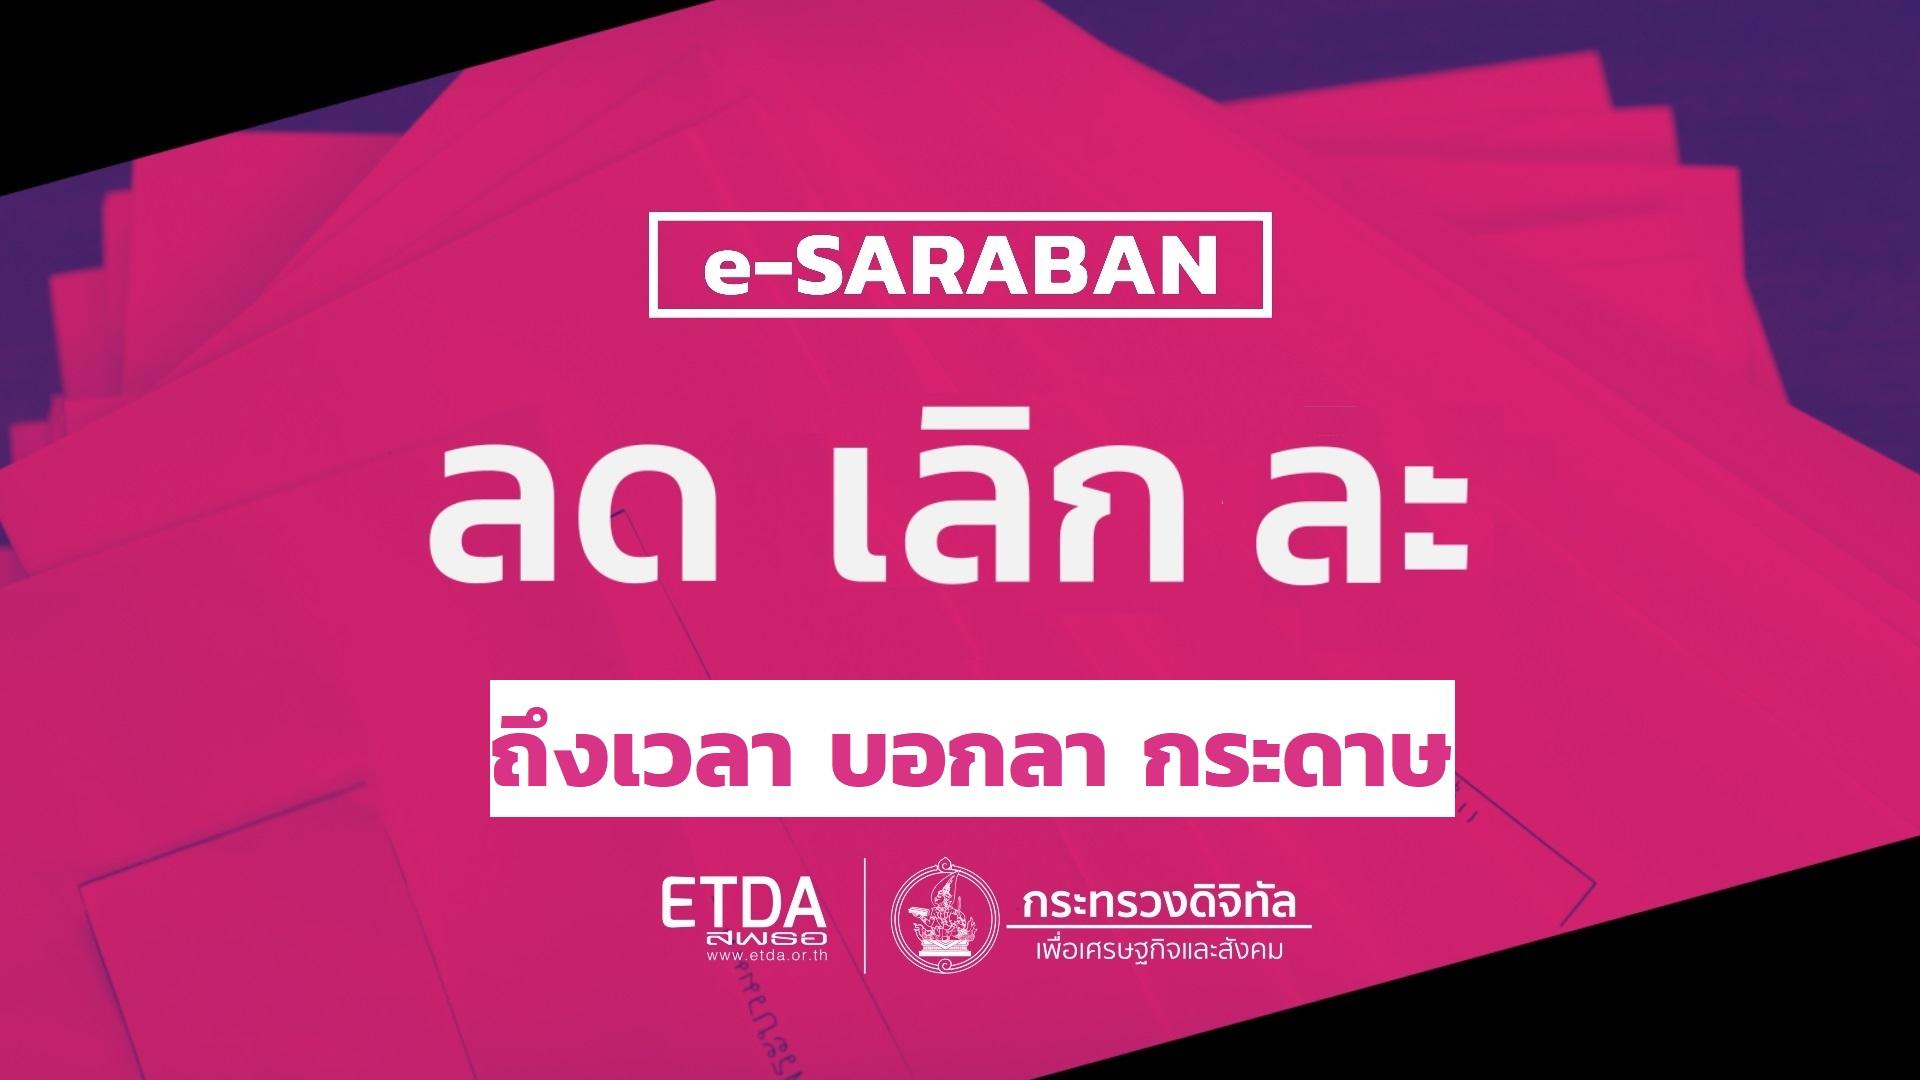 e-Saraban : ลด เลิก ละ ถึงเวลา บอกลา กระดาษ